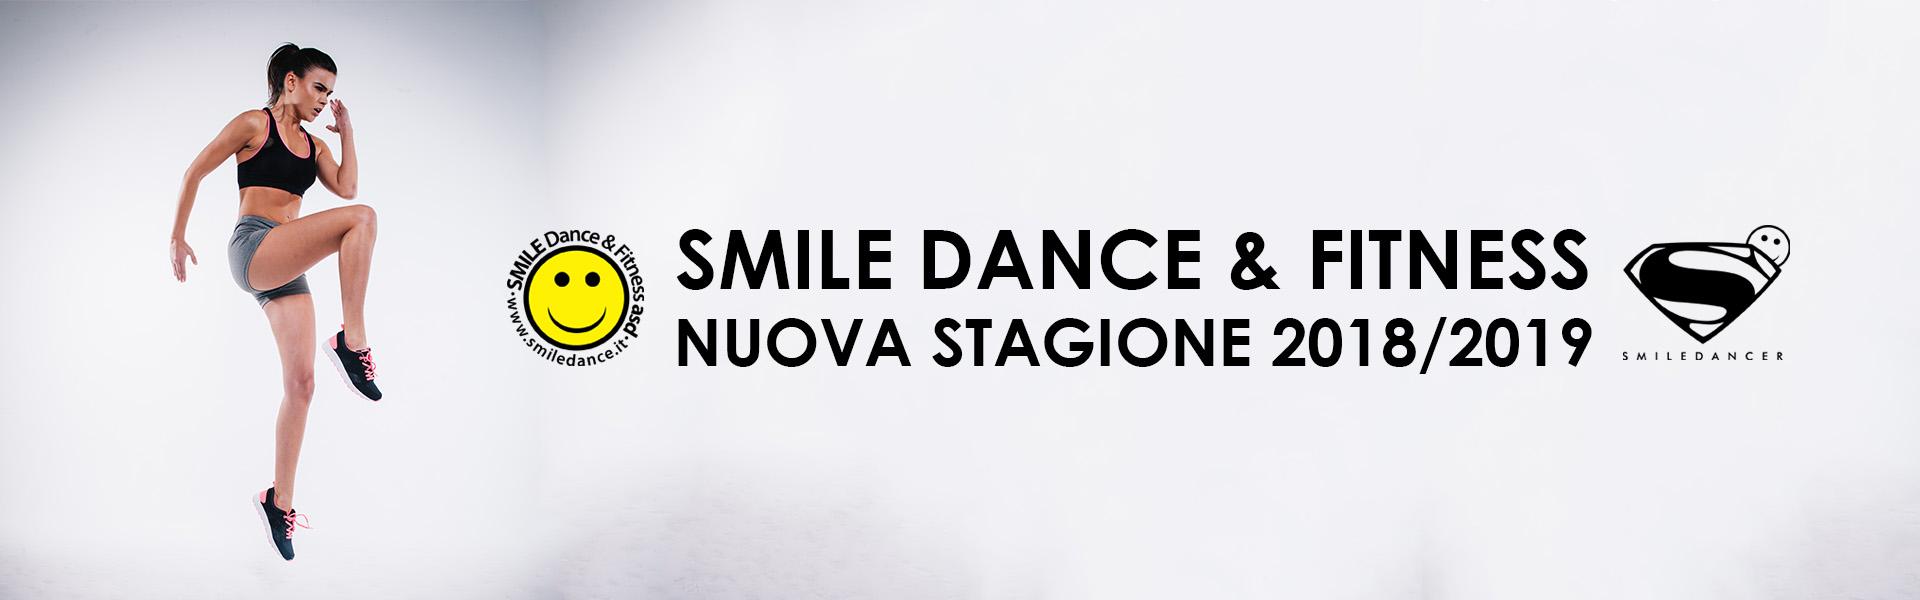 smile dance & fitness stagione 2019